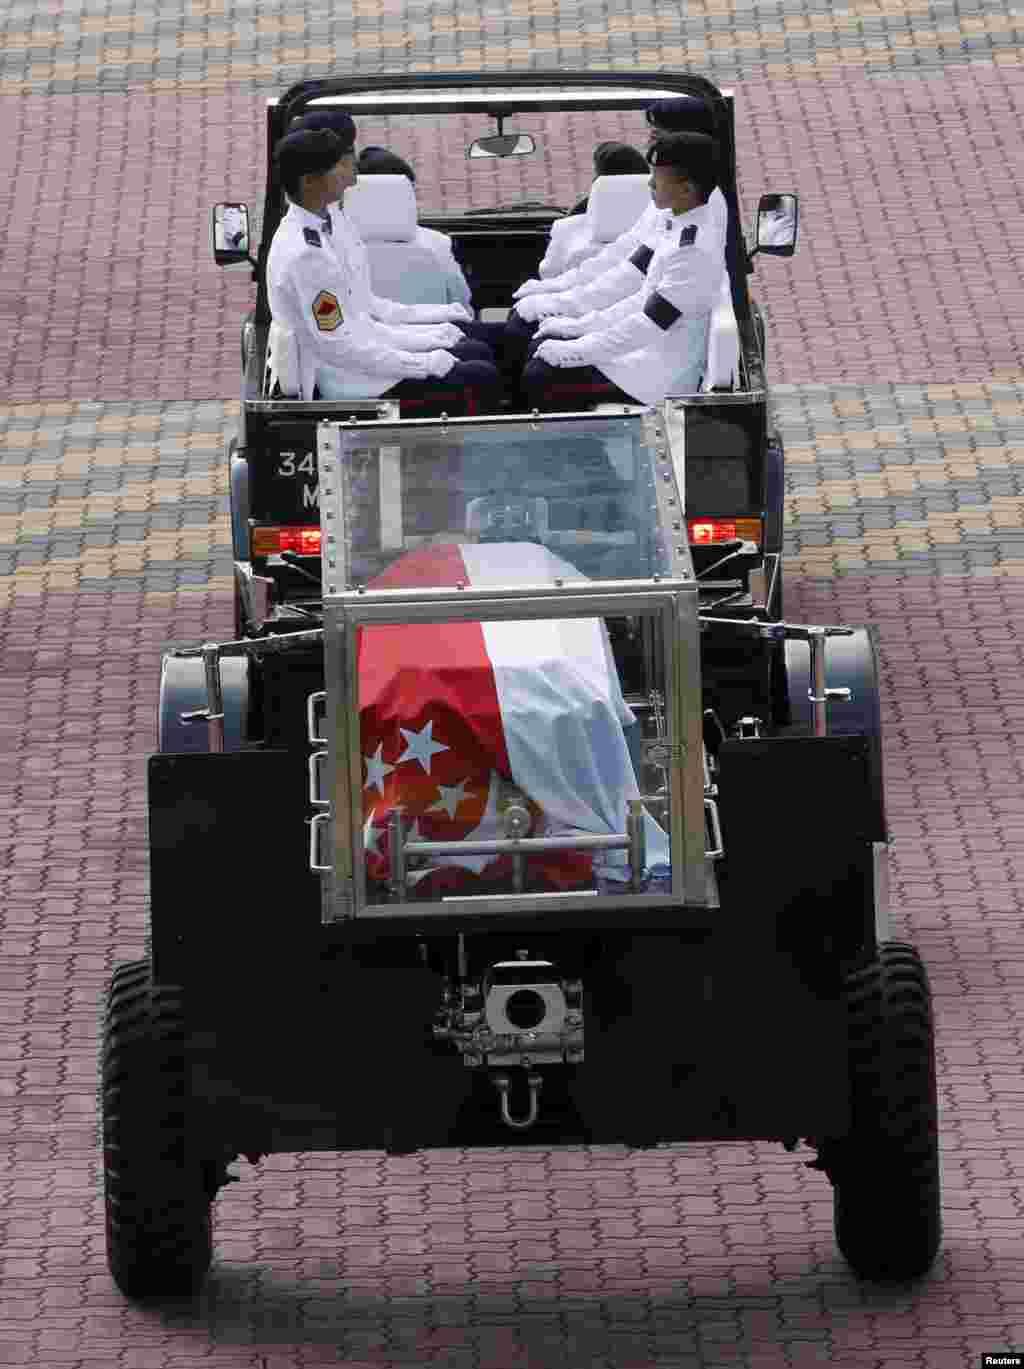 Kendaraan terbuka yang membawa jenazah perdana menteri pertama Singapura tiba di Gedung Parlemen tempat ia akan disemayamkan sampai Sabtu di Singapura (25/3).